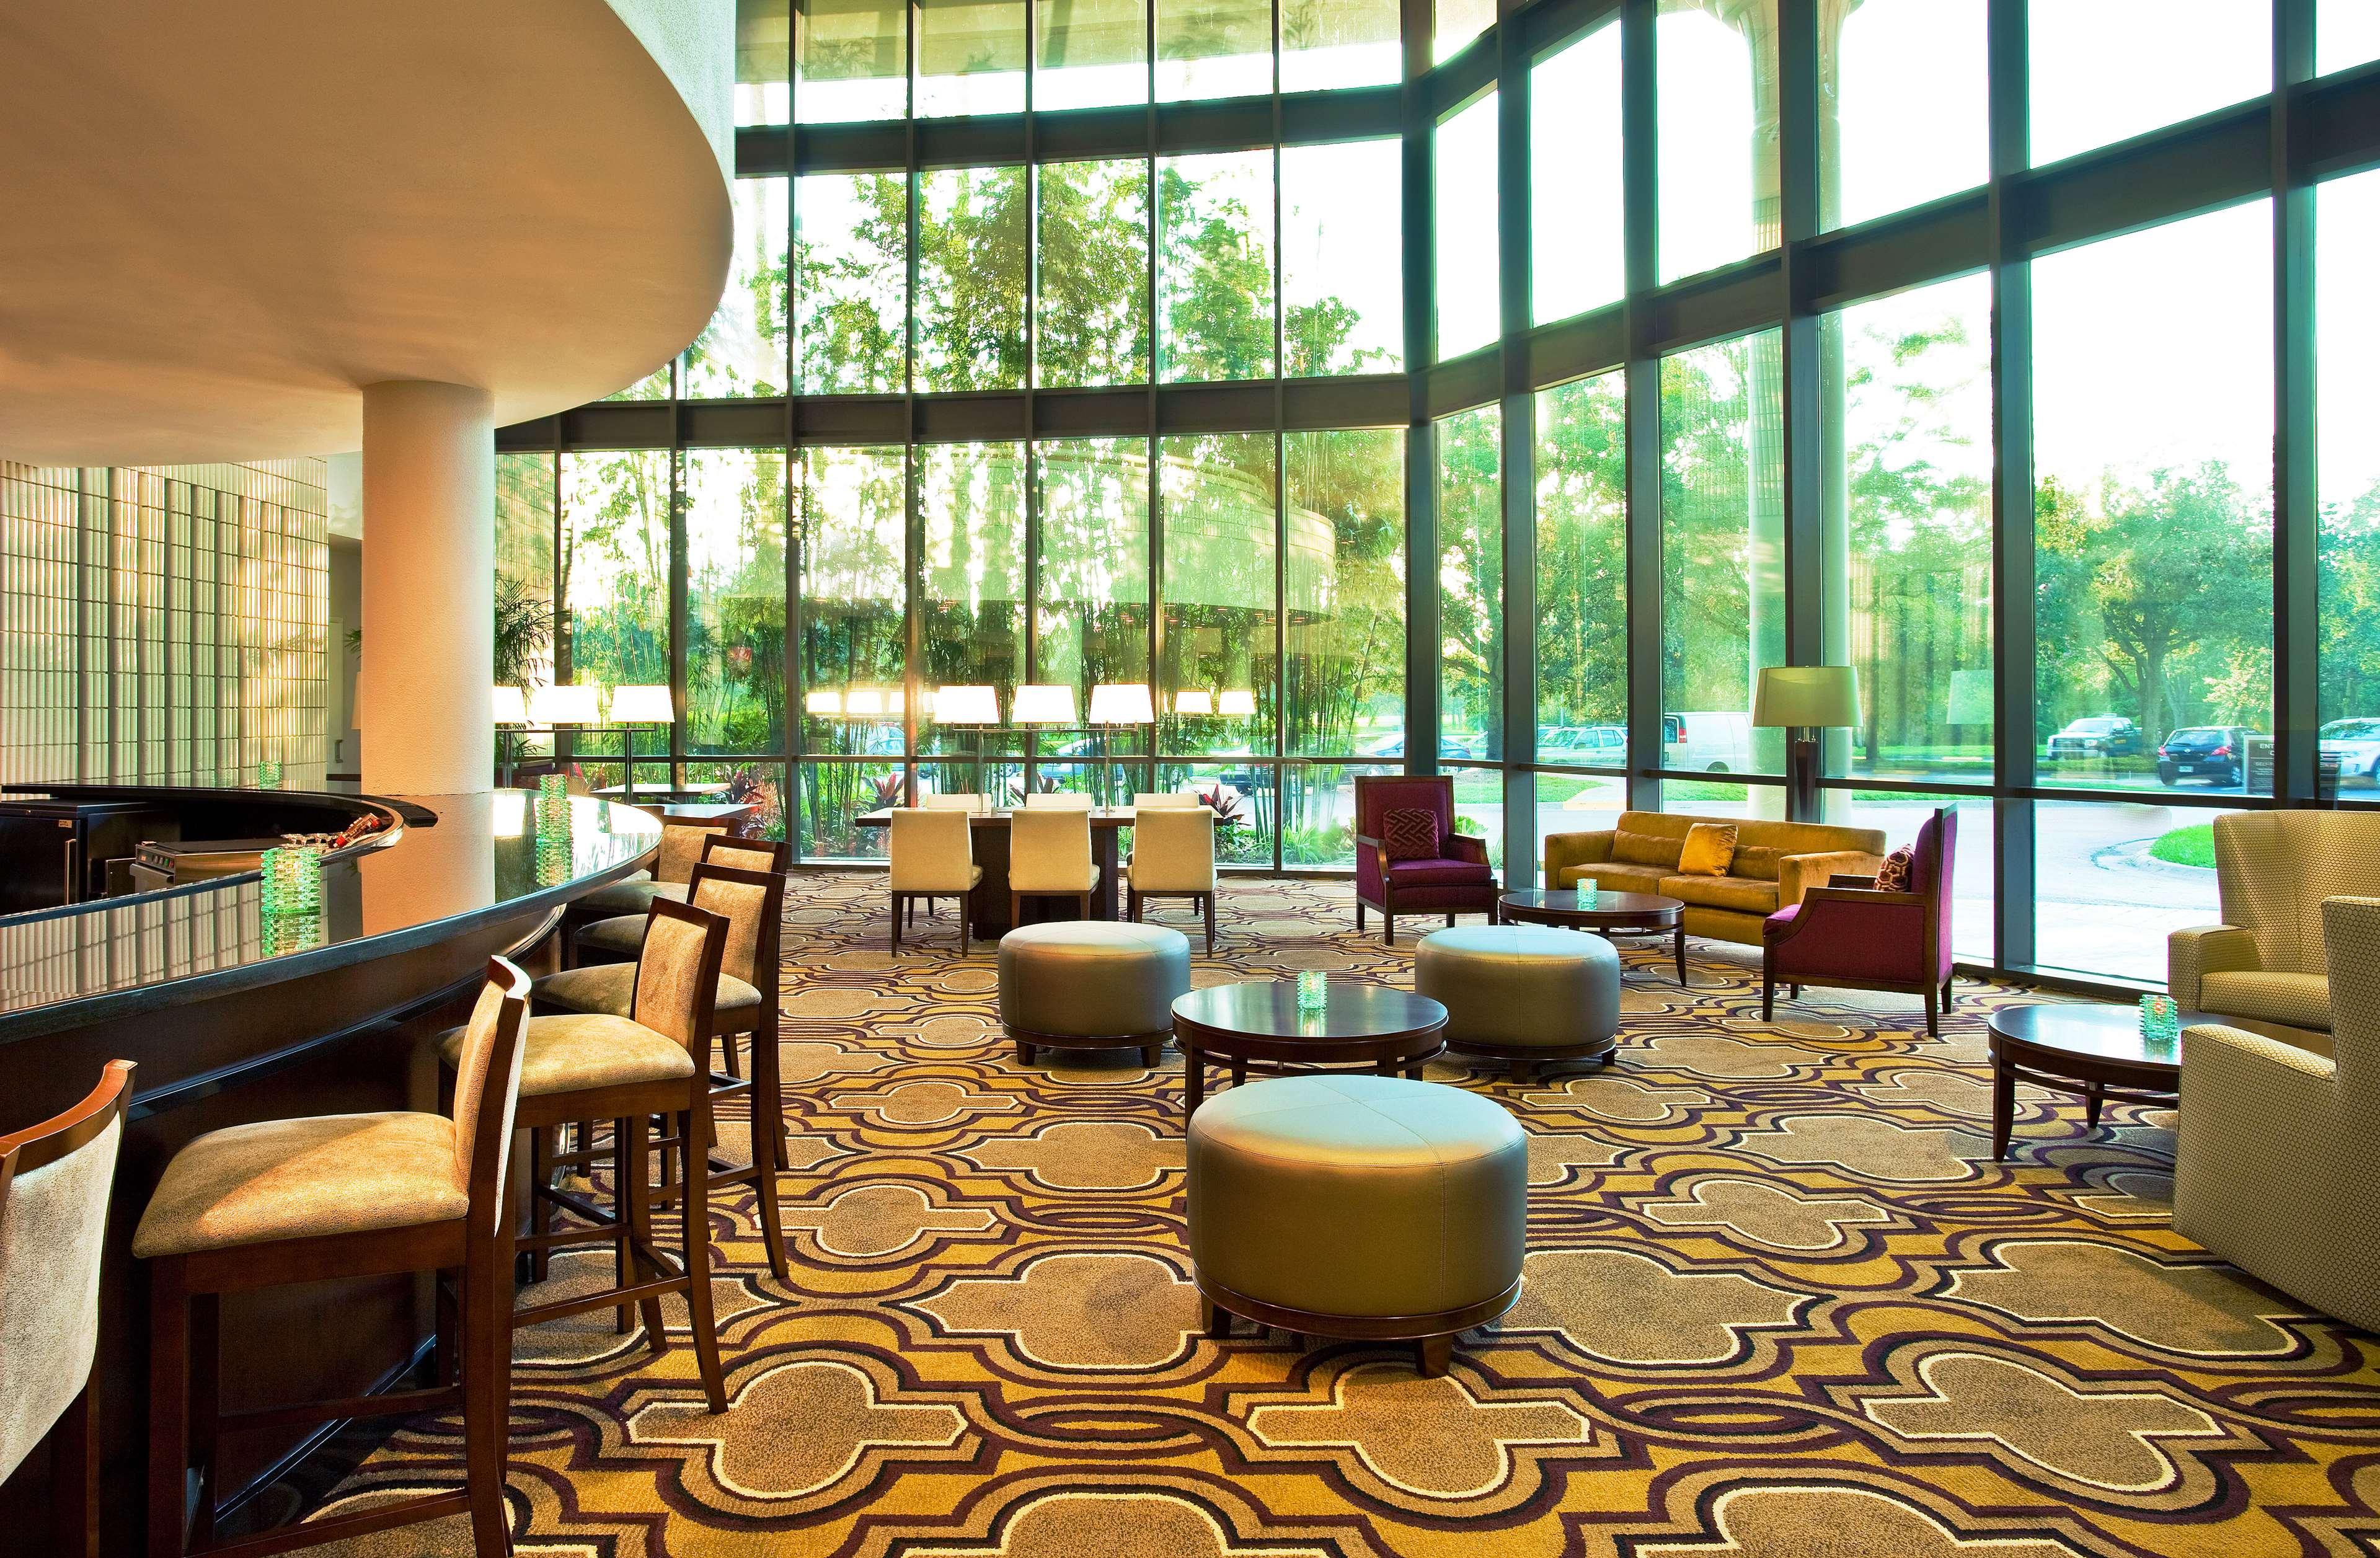 Sheraton Tampa Brandon Hotel image 9